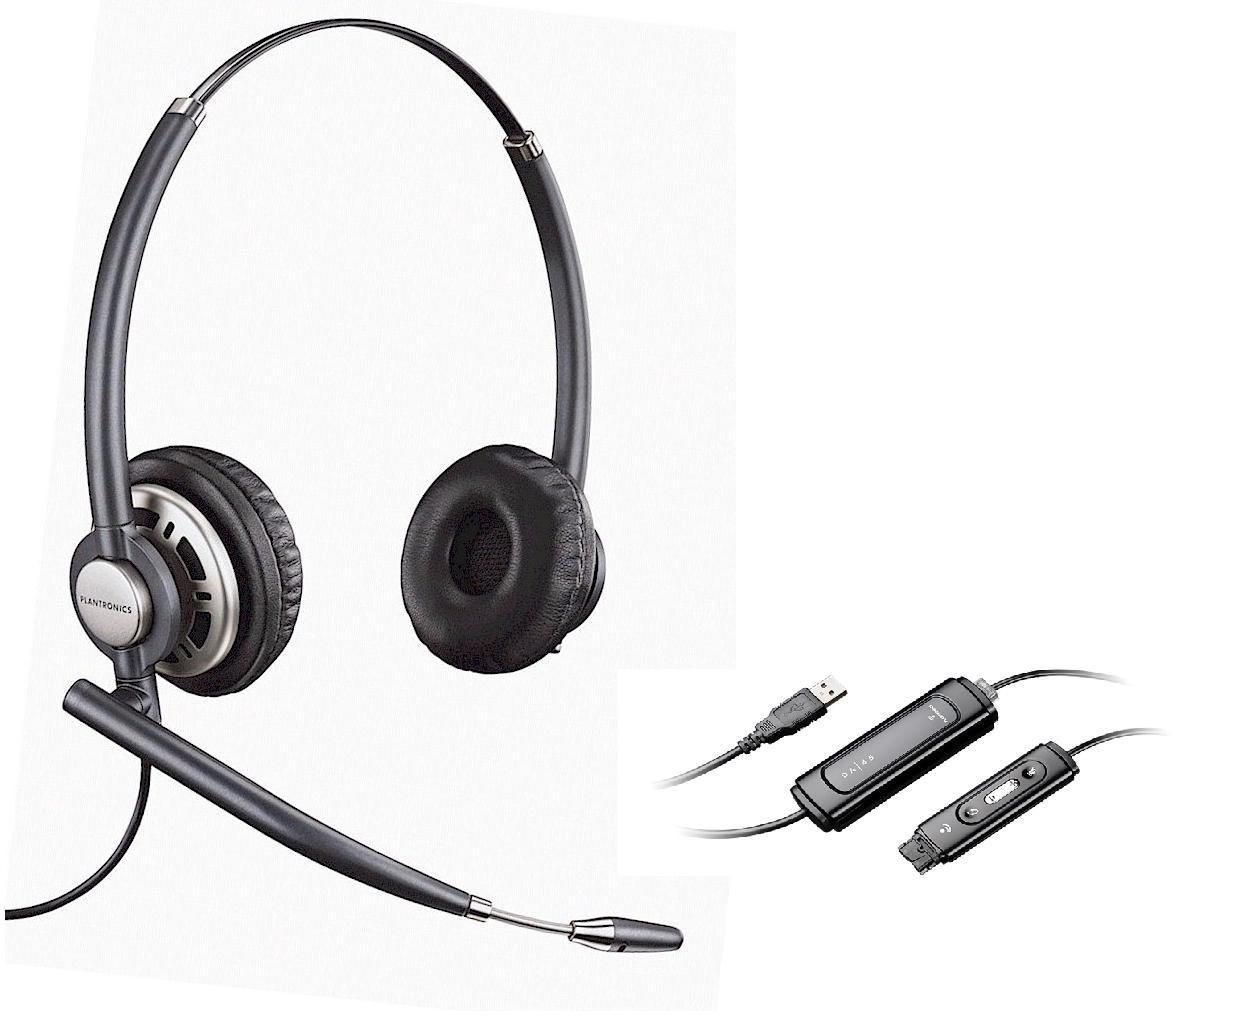 Plantronics Encore Pro HW301 N/A Binaural Noise Cancelling USB Headset